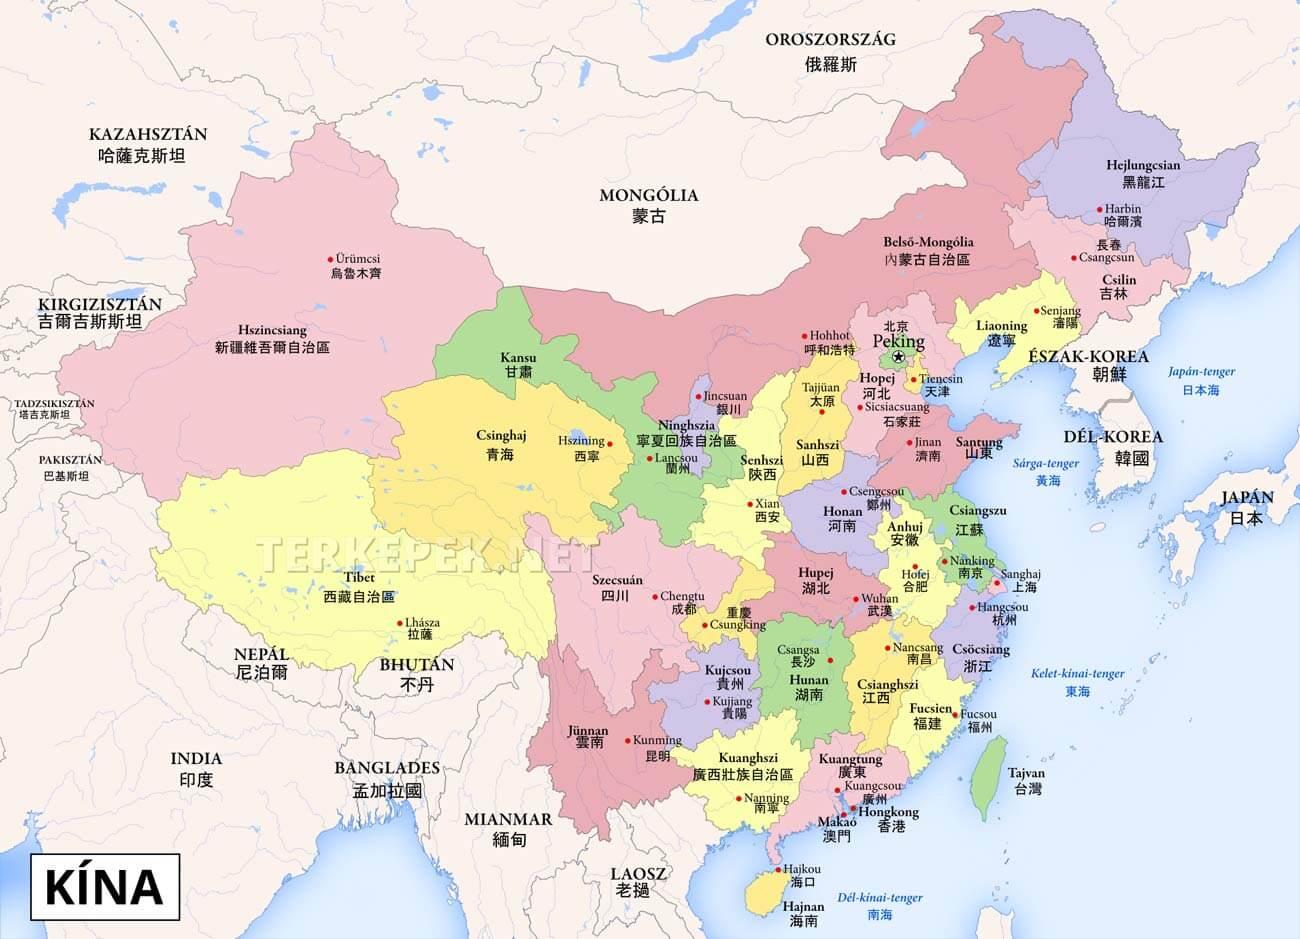 kína domborzati térkép Kína domborzati térképe kína domborzati térkép